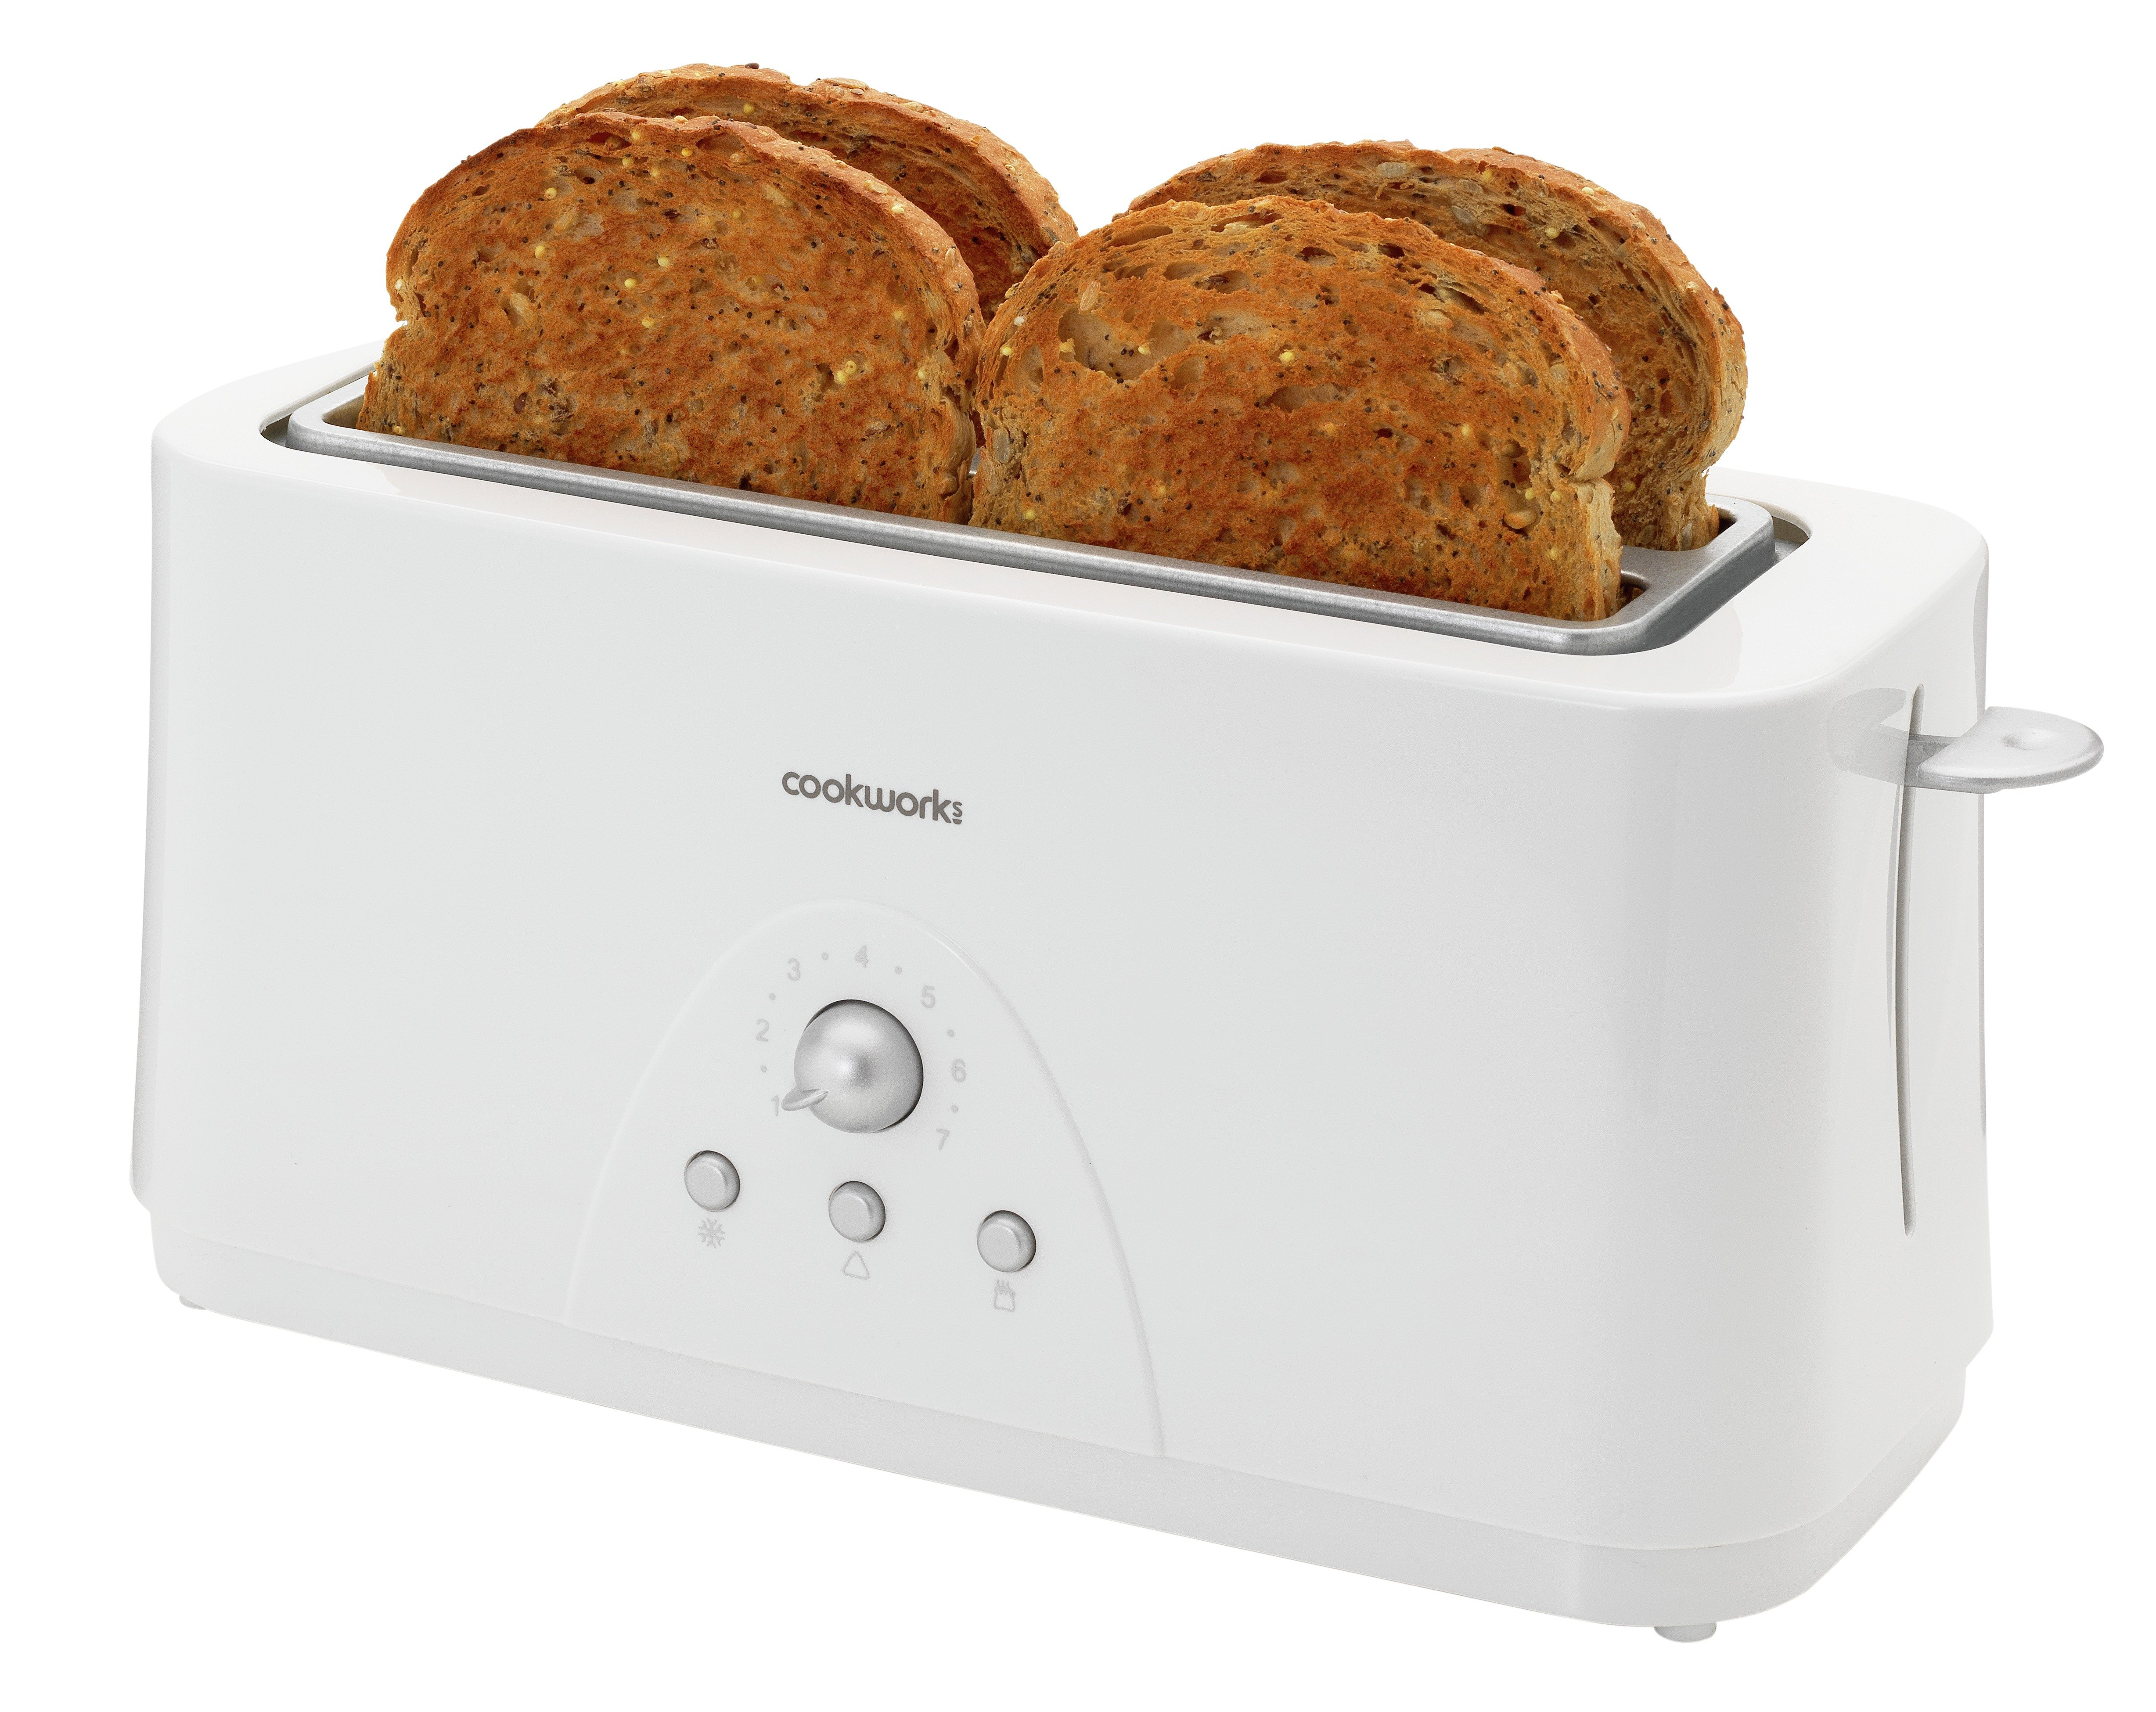 Image of Cookworks Long Slot 4 Slice Toaster - White